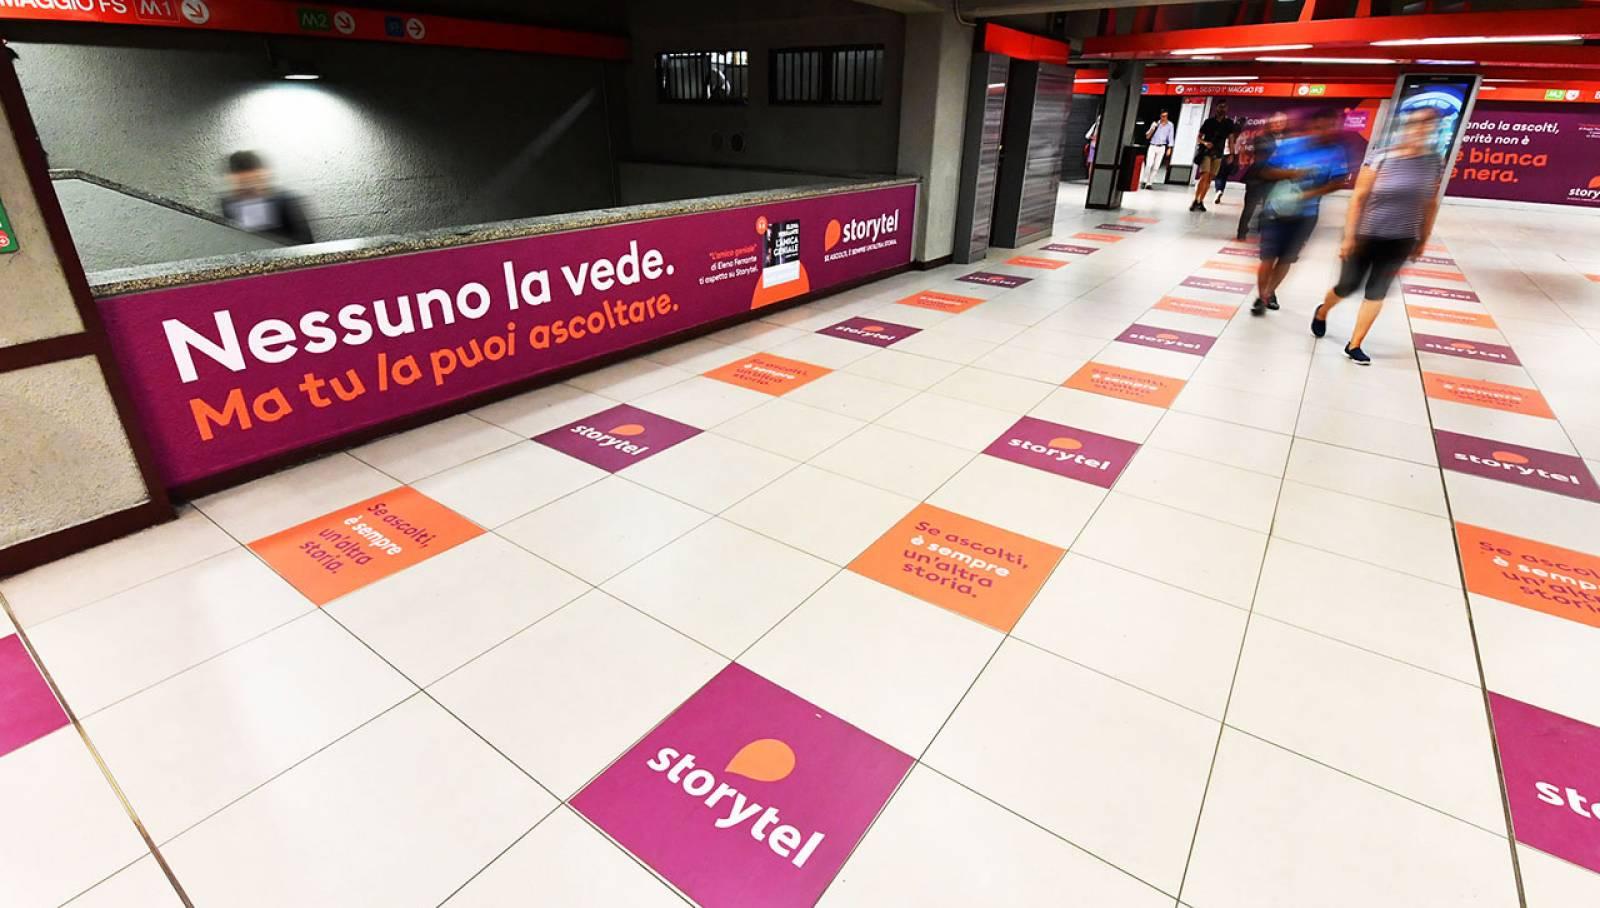 Underground advertising in Milan IGPDecaux Station Domination for Storytel